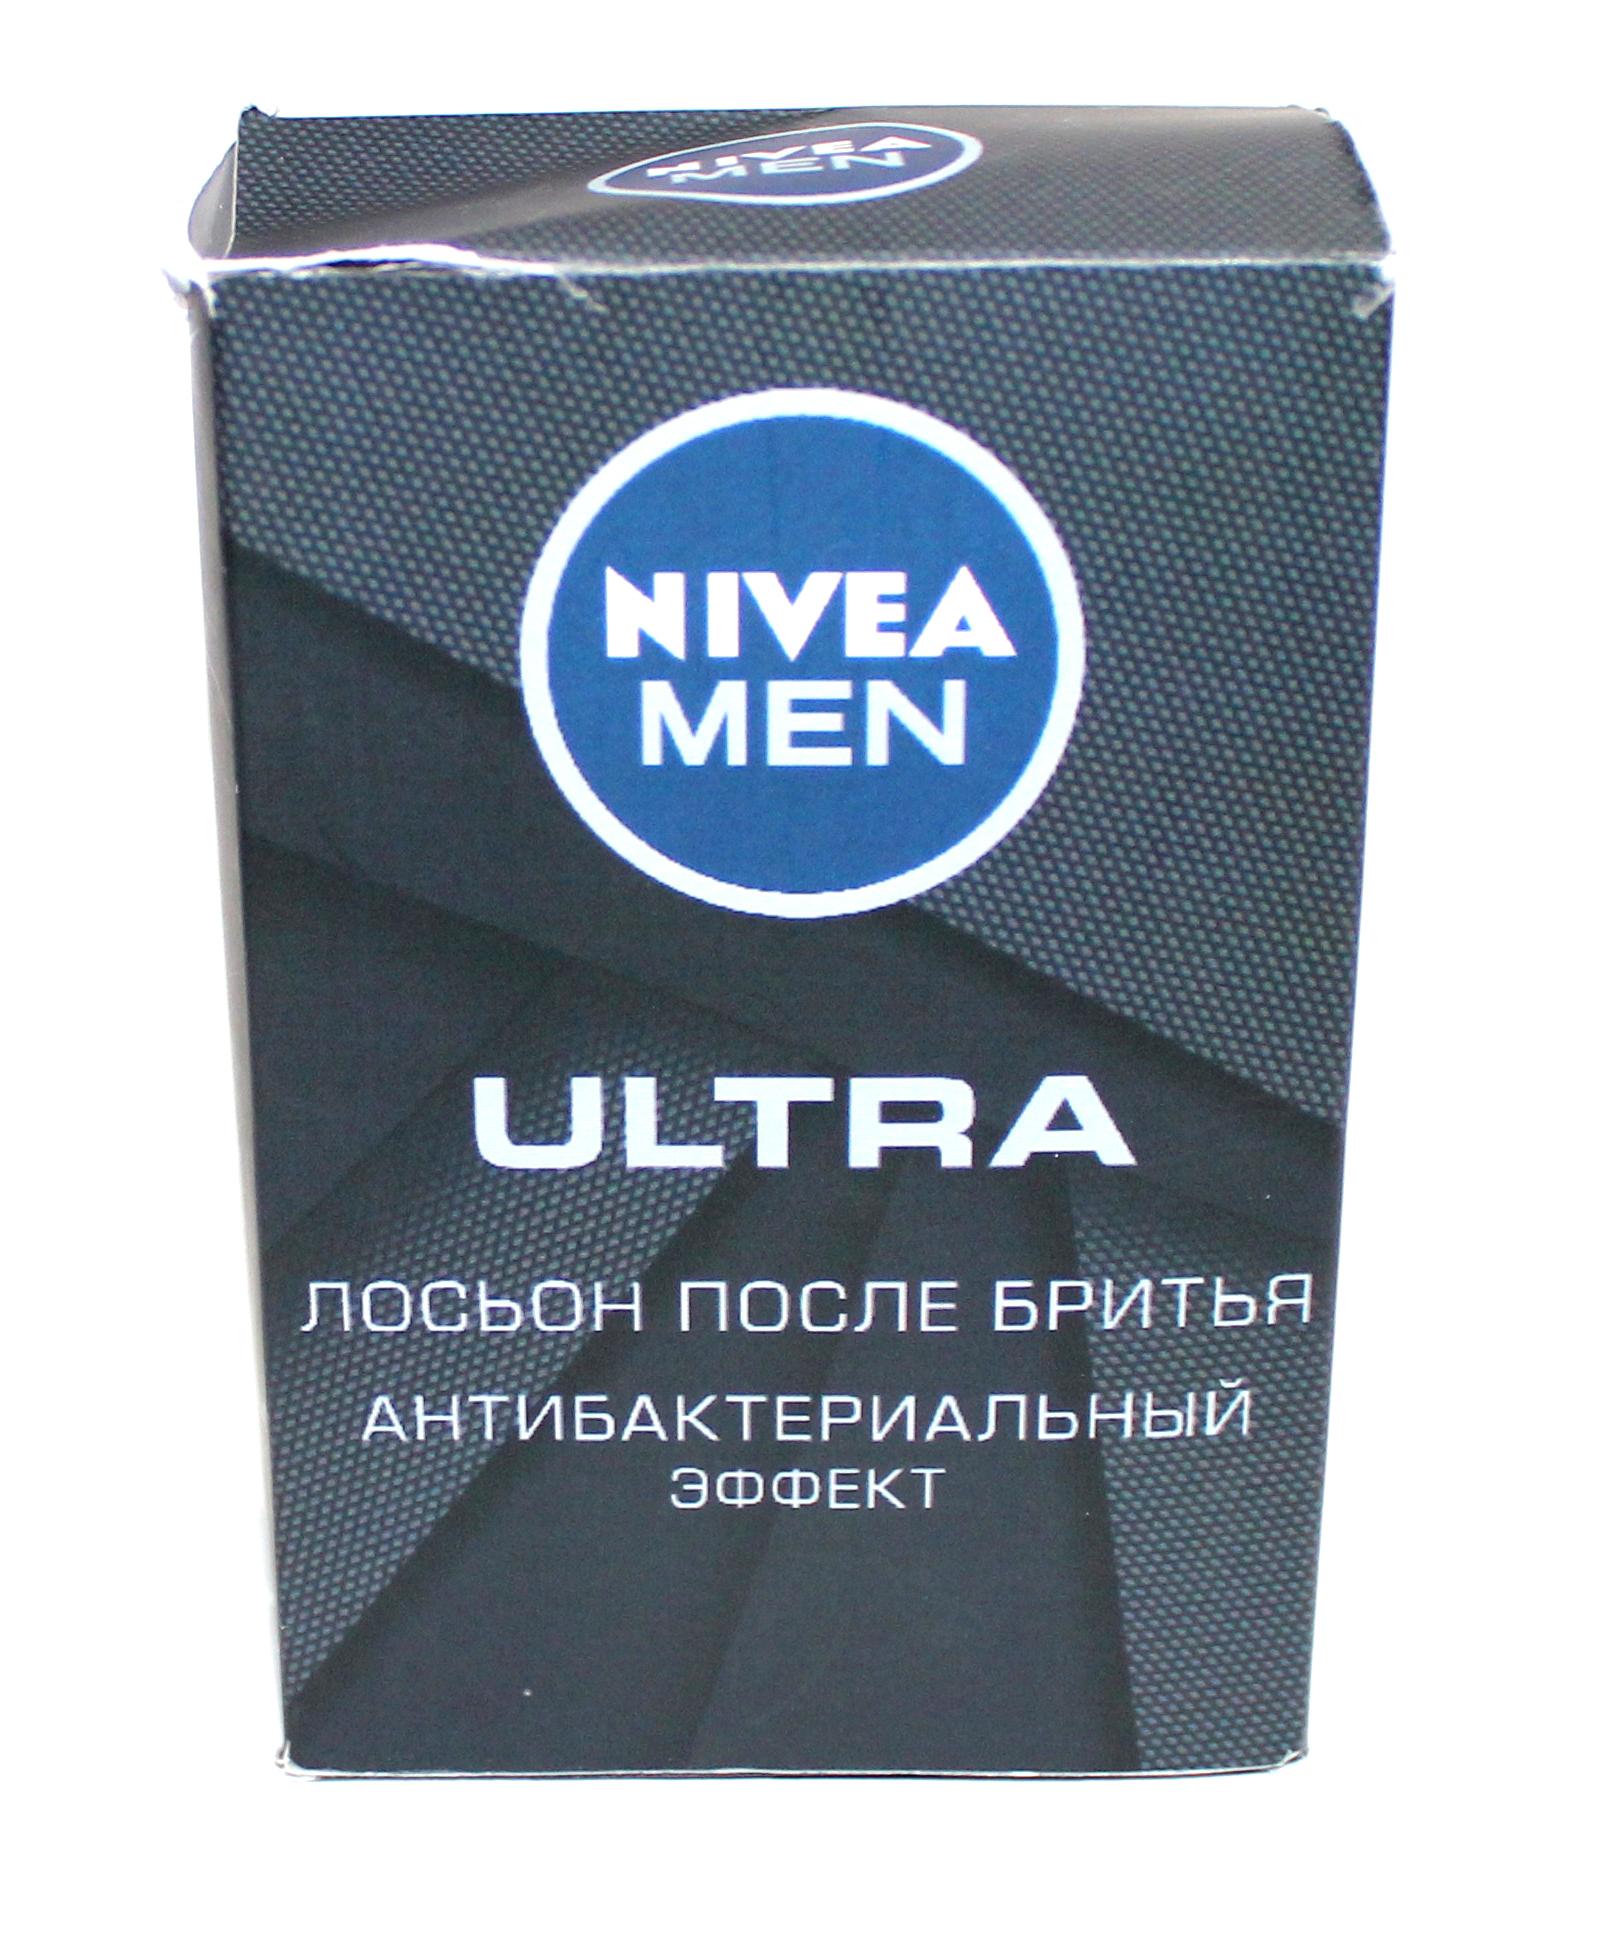 NIVEA - ЛОСЬОН ПОСЛЕ БРИТЬЯ NIVEA 100мл ULTRA 4005900495341